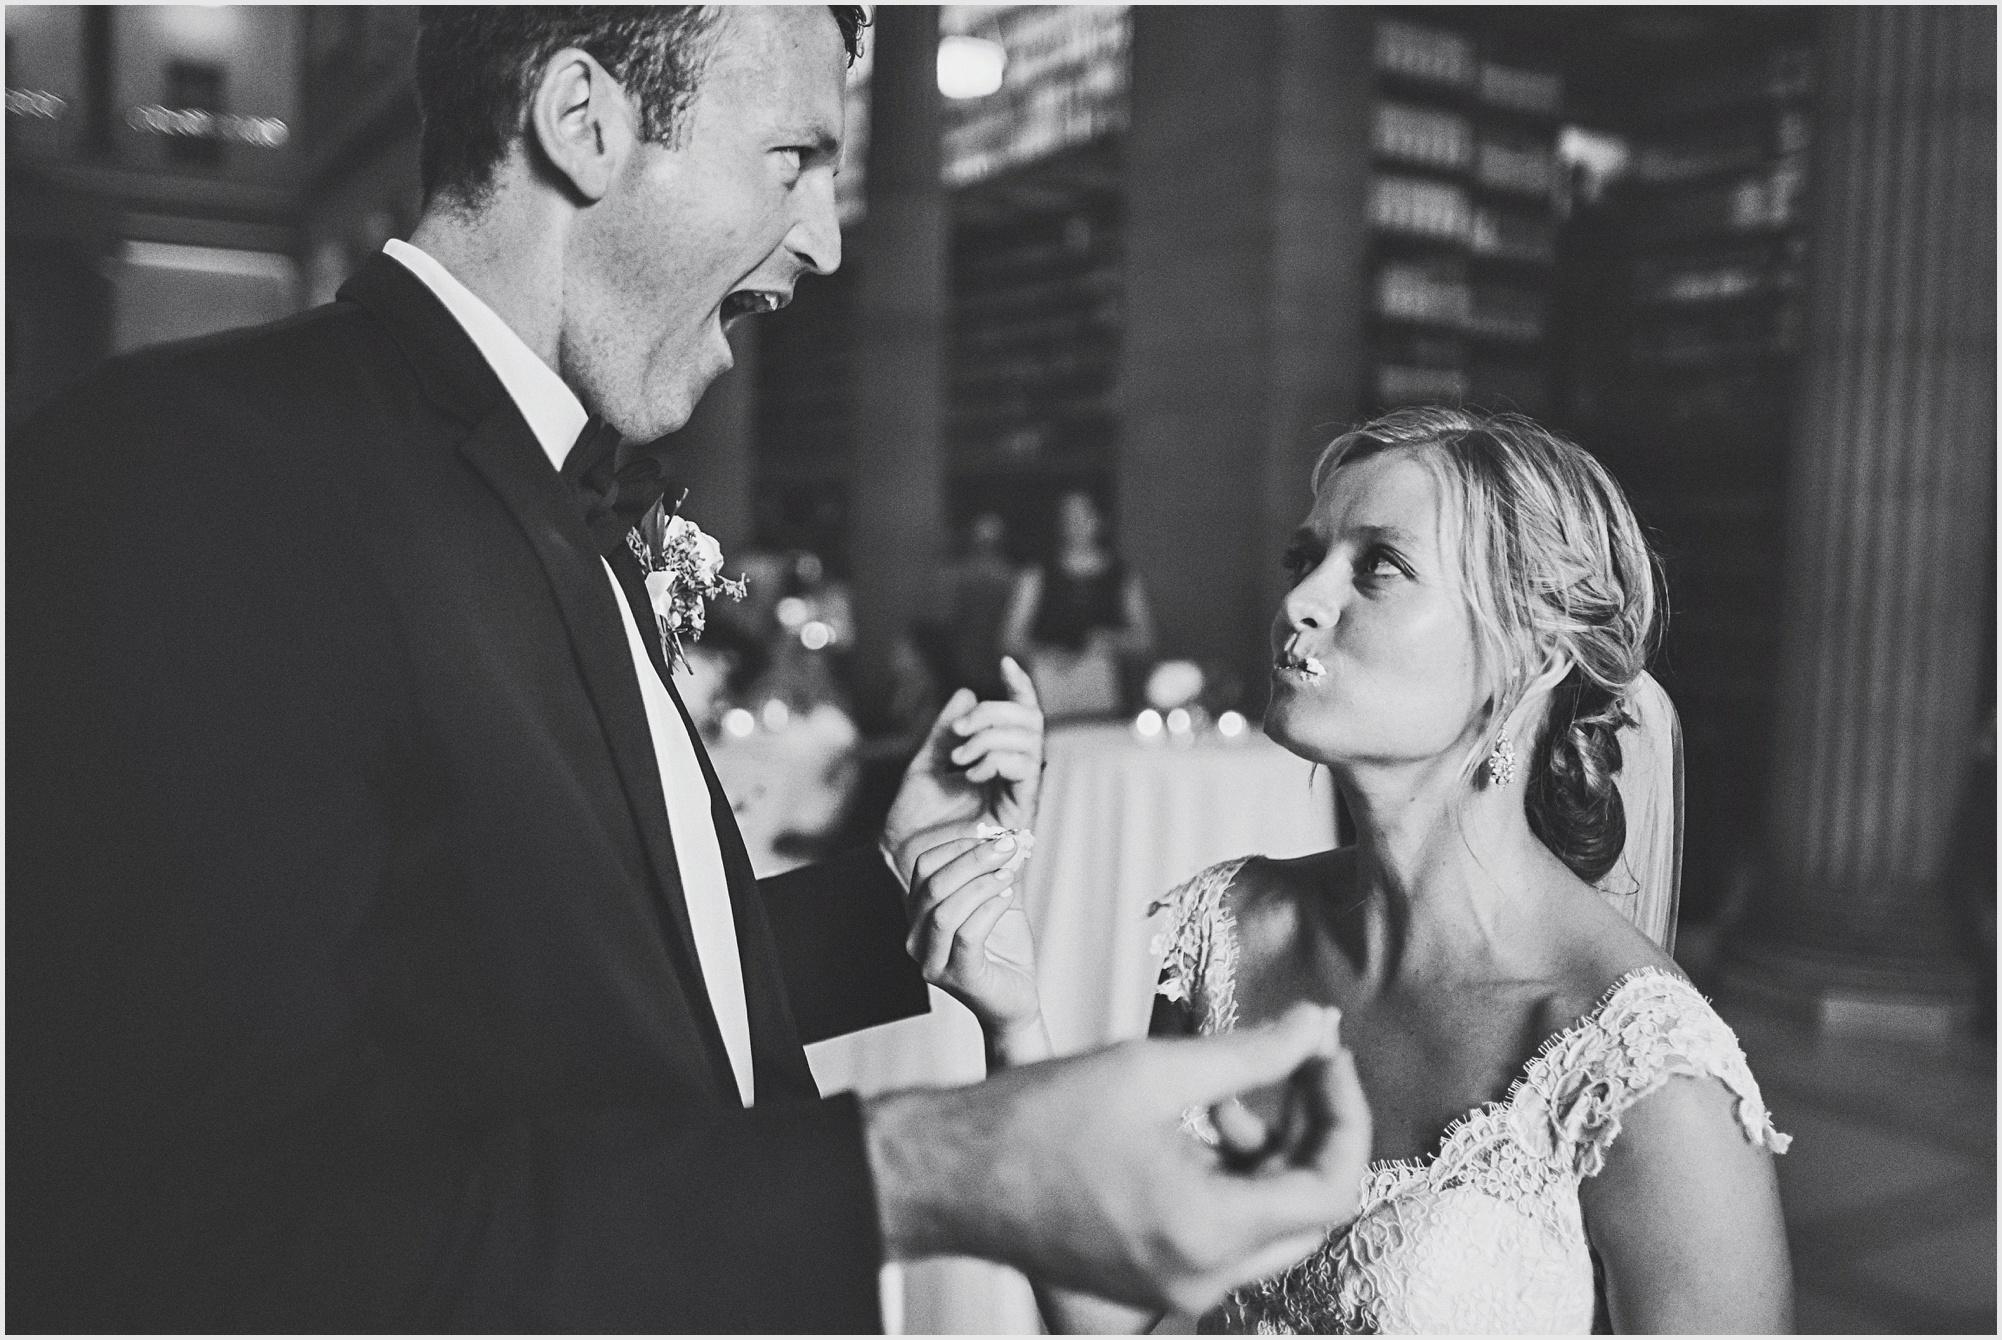 maura_david_james_j_hill_wedding_lucas_botz_photography_046.jpg